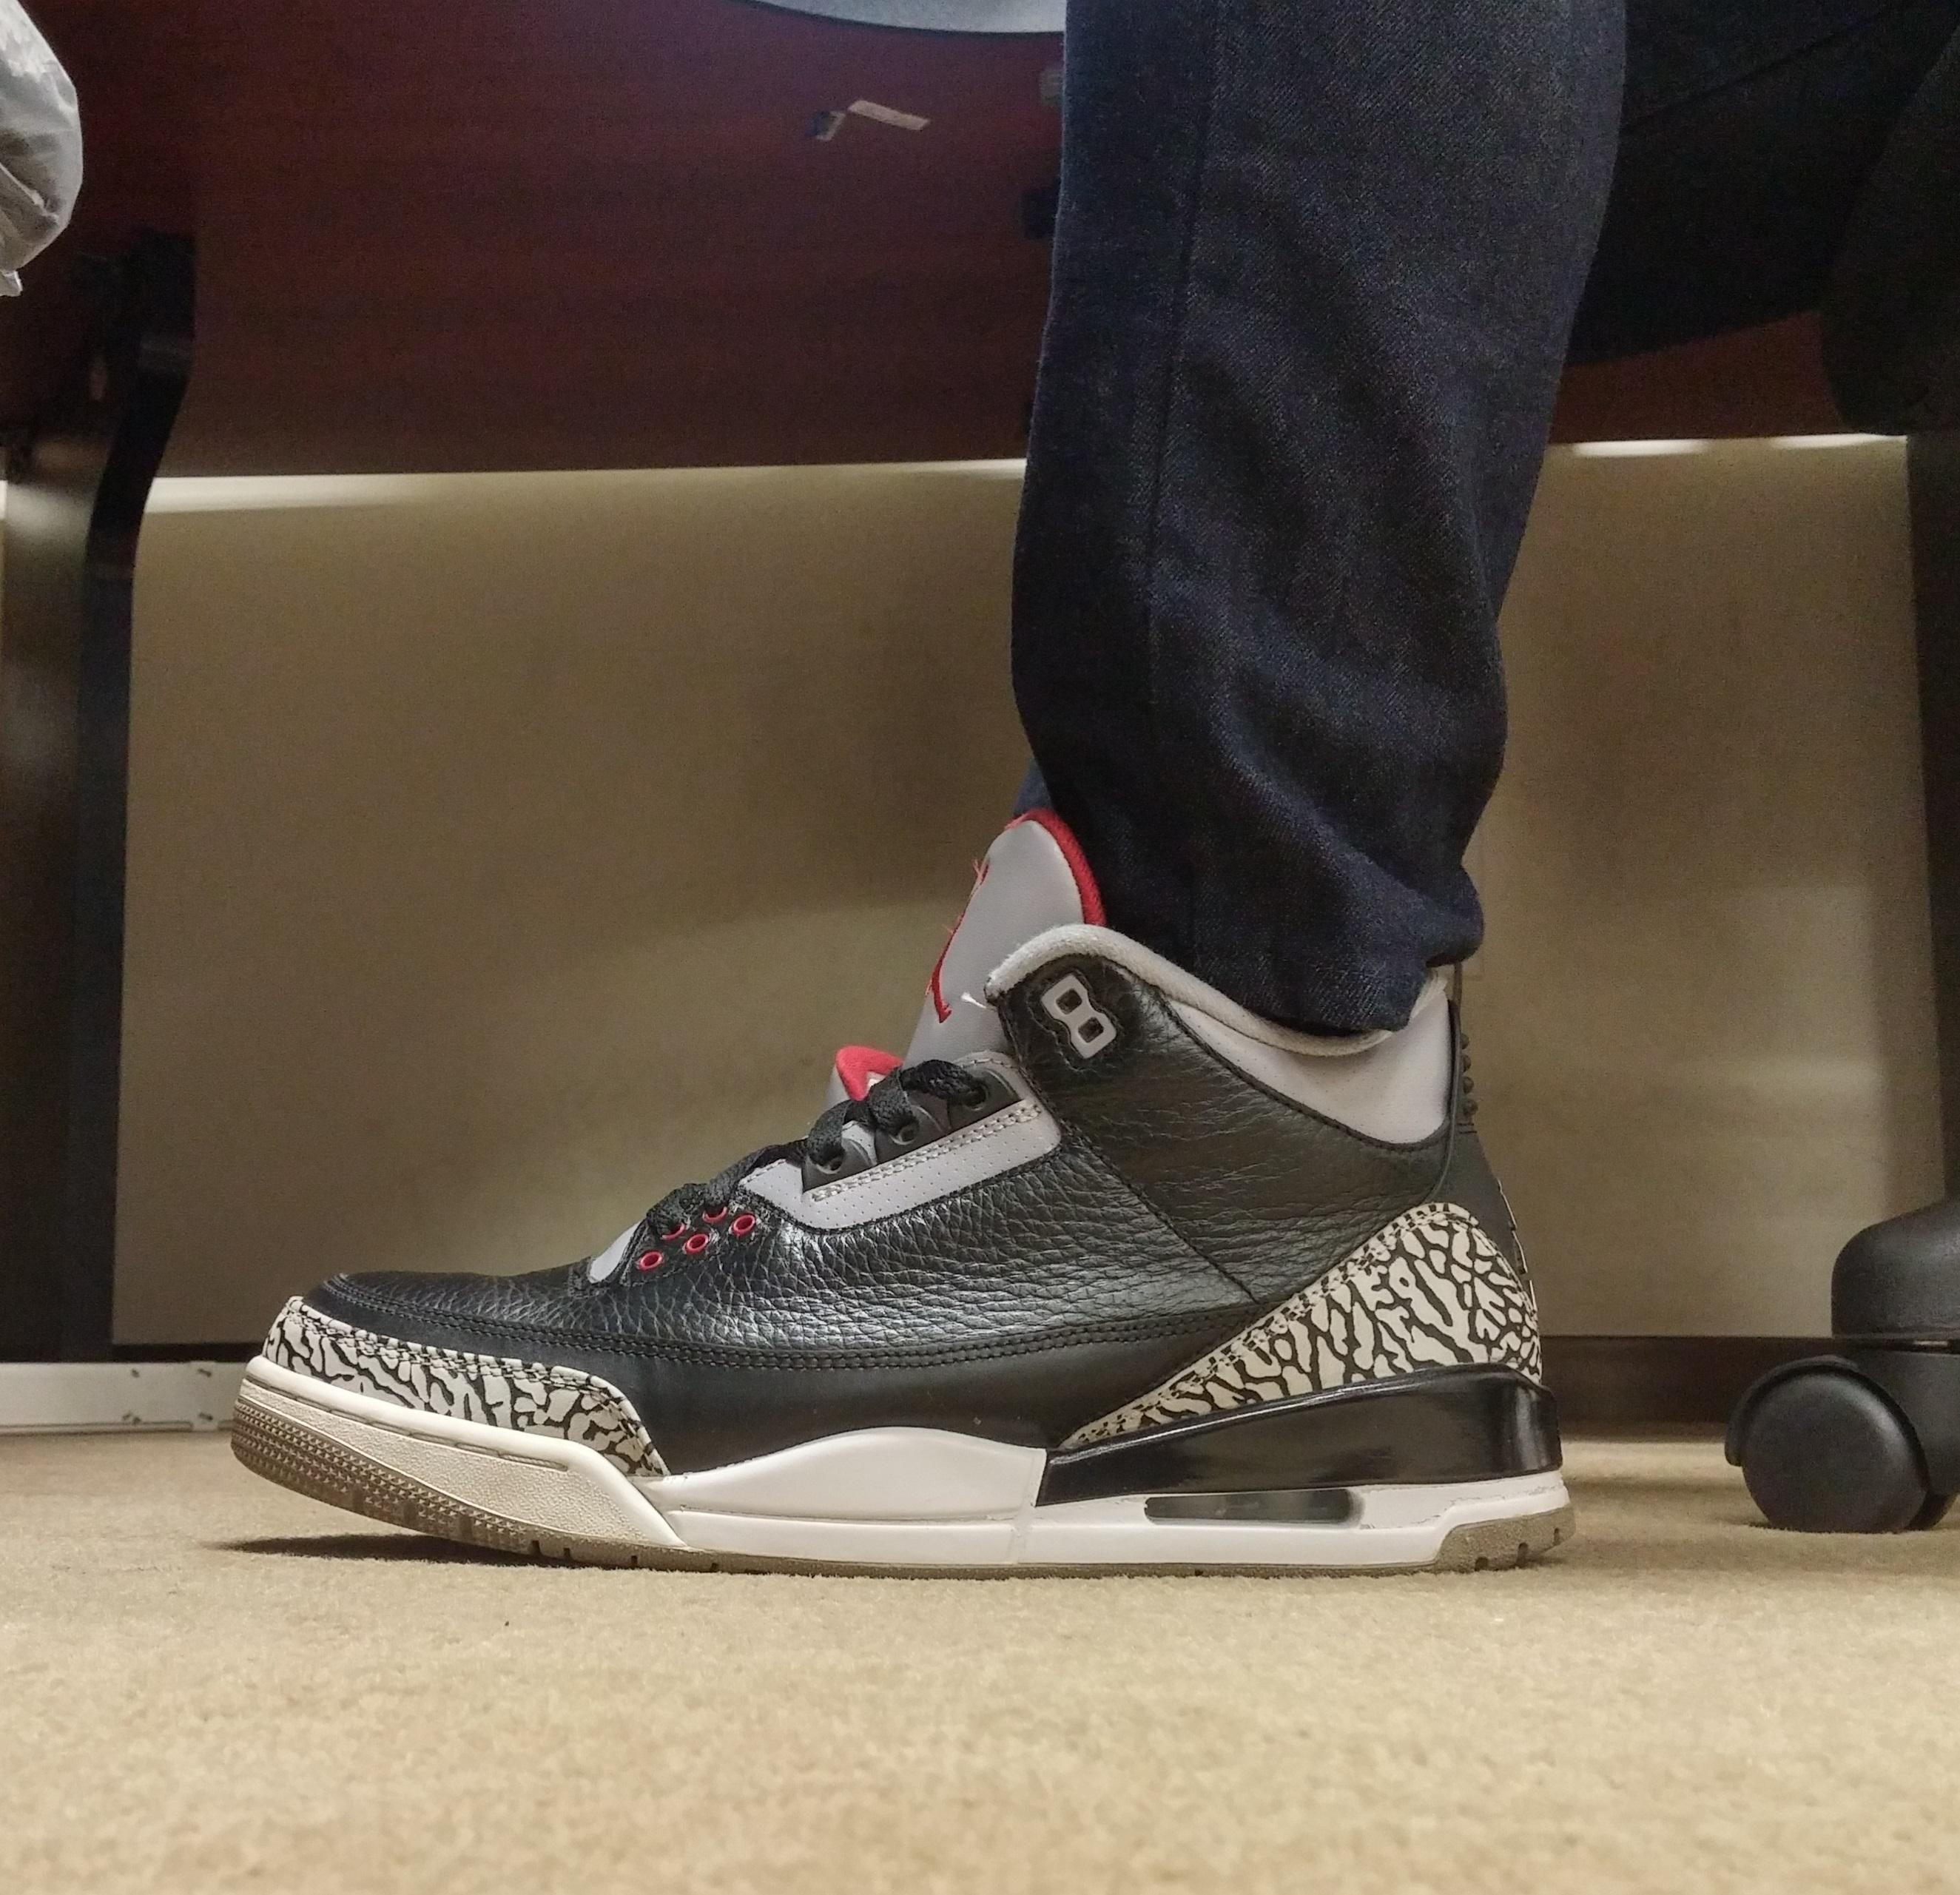 [WDYWT] The GOAT of Jordans (IMO)